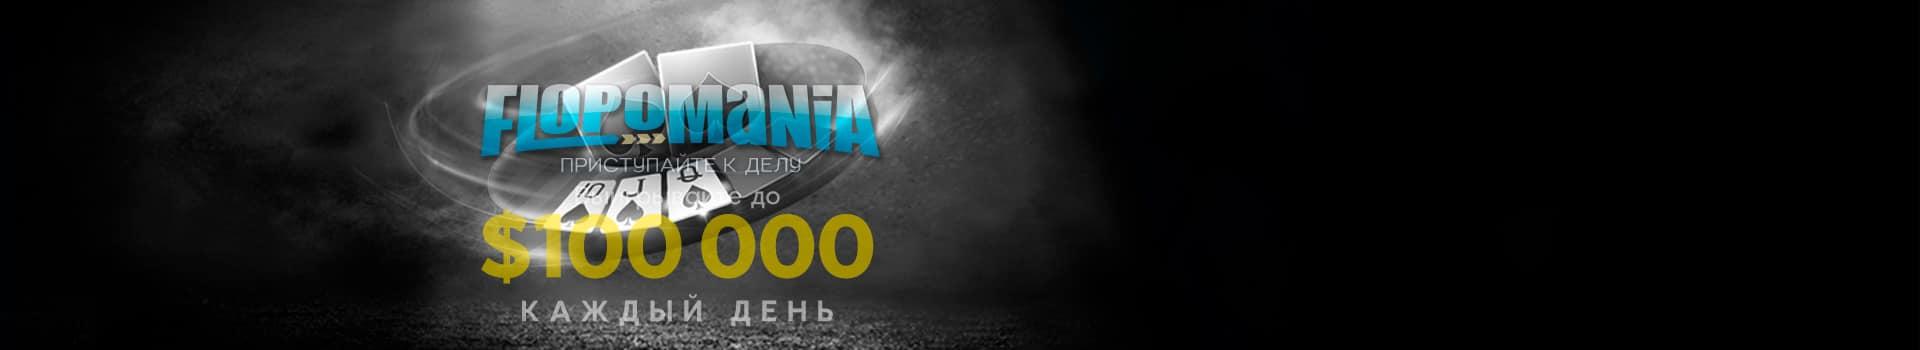 Flopomania: новый игровой формат на онлайн-платформе 888 Poker